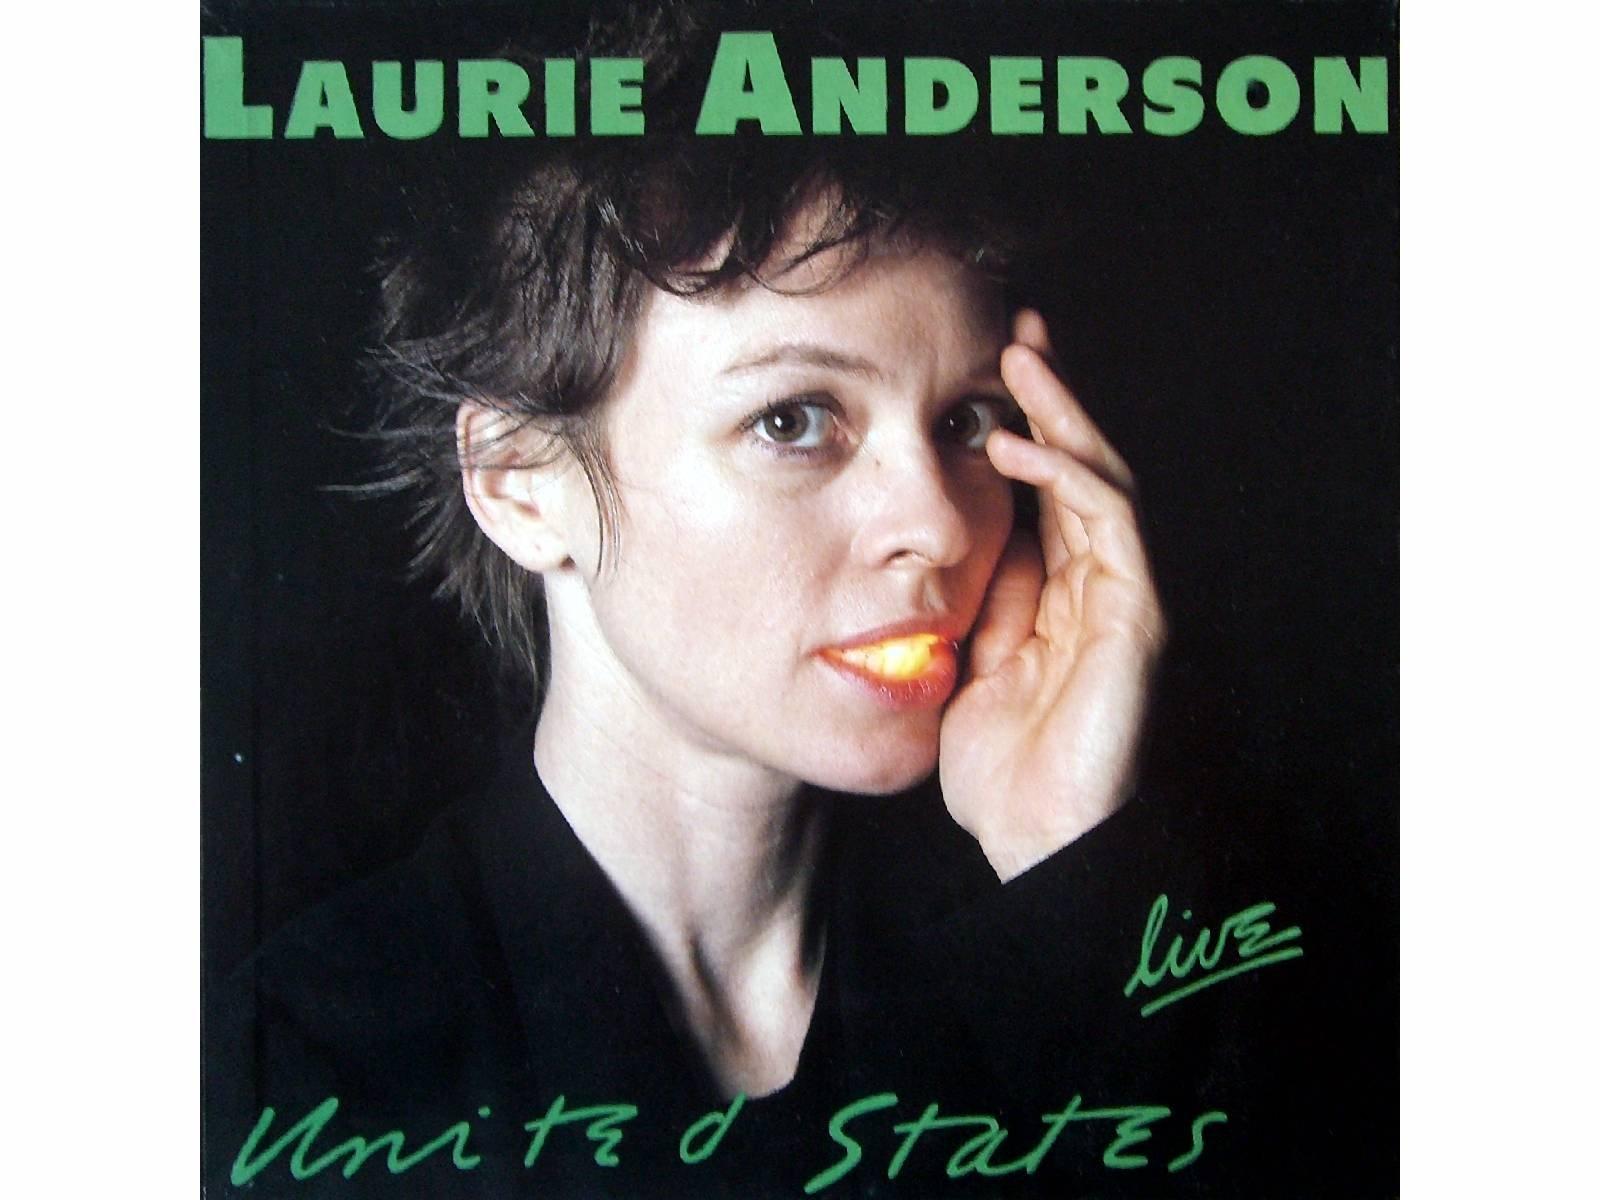 United States Live [Vinyl] by Warner Bros / Wea (Image #1)